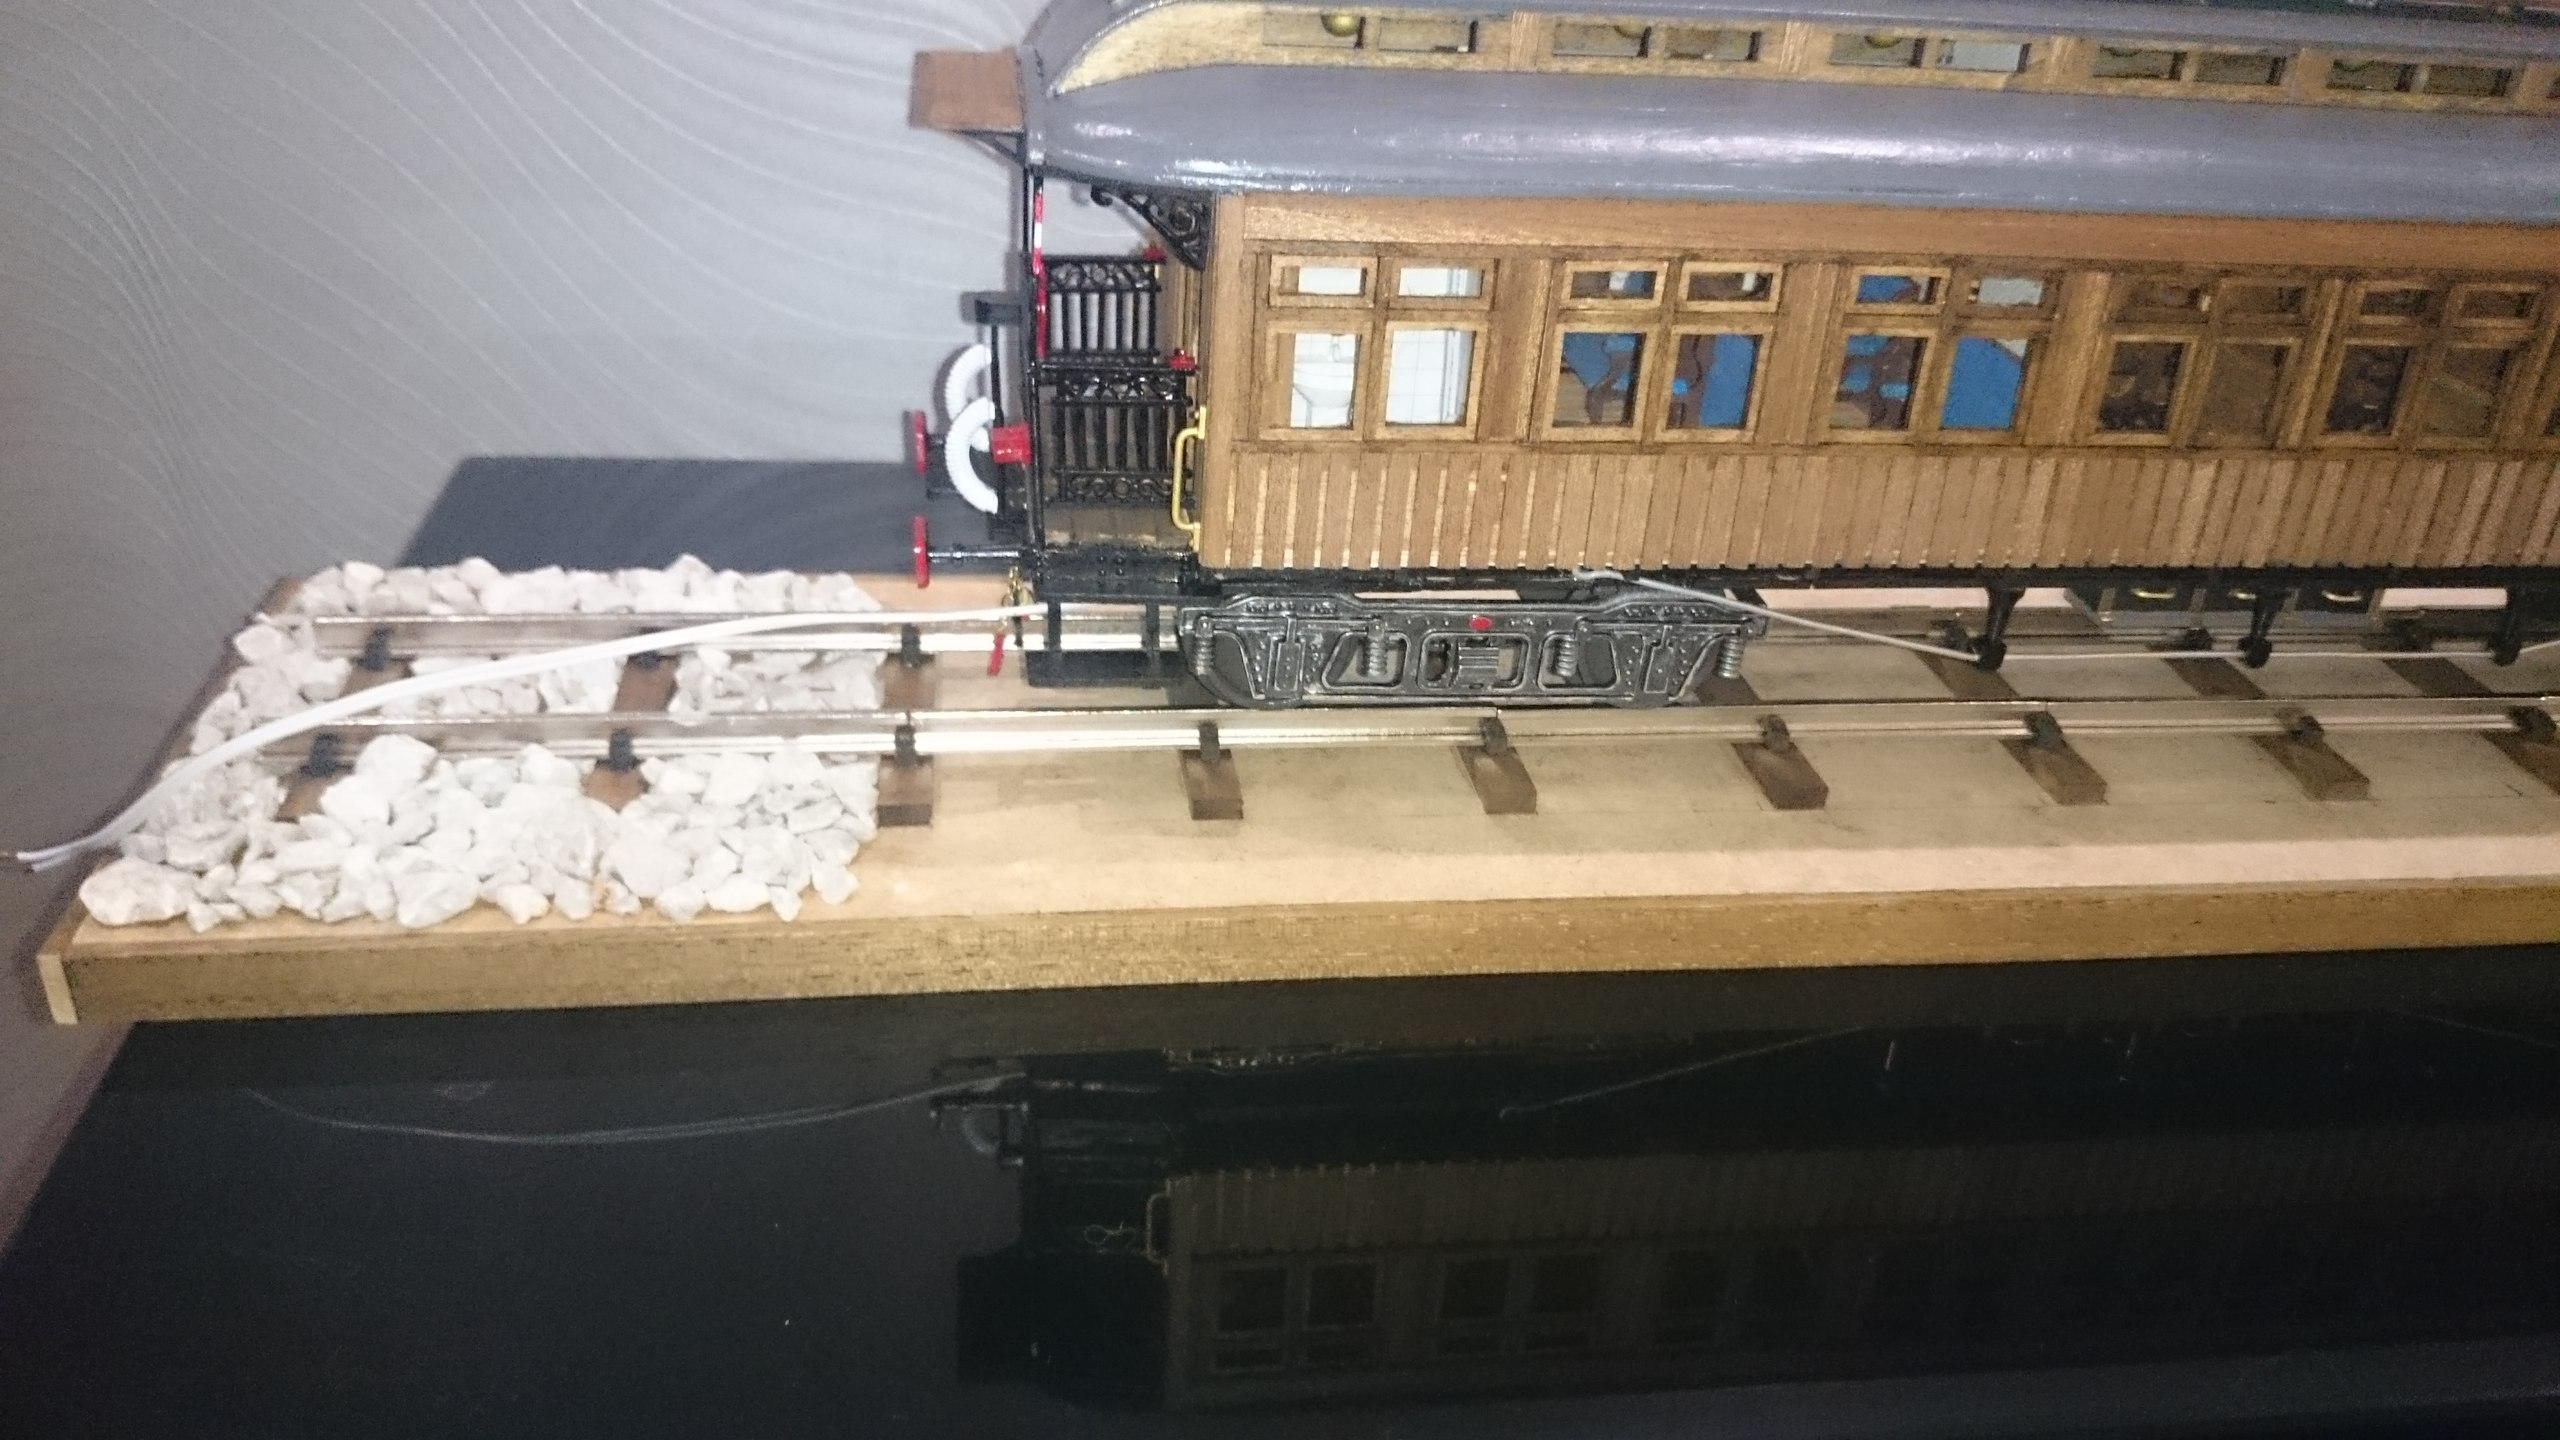 Модель вагона Costa Coach Масштаб 1:32 OcCre (качество фото не очень) COcNY3_2dBg